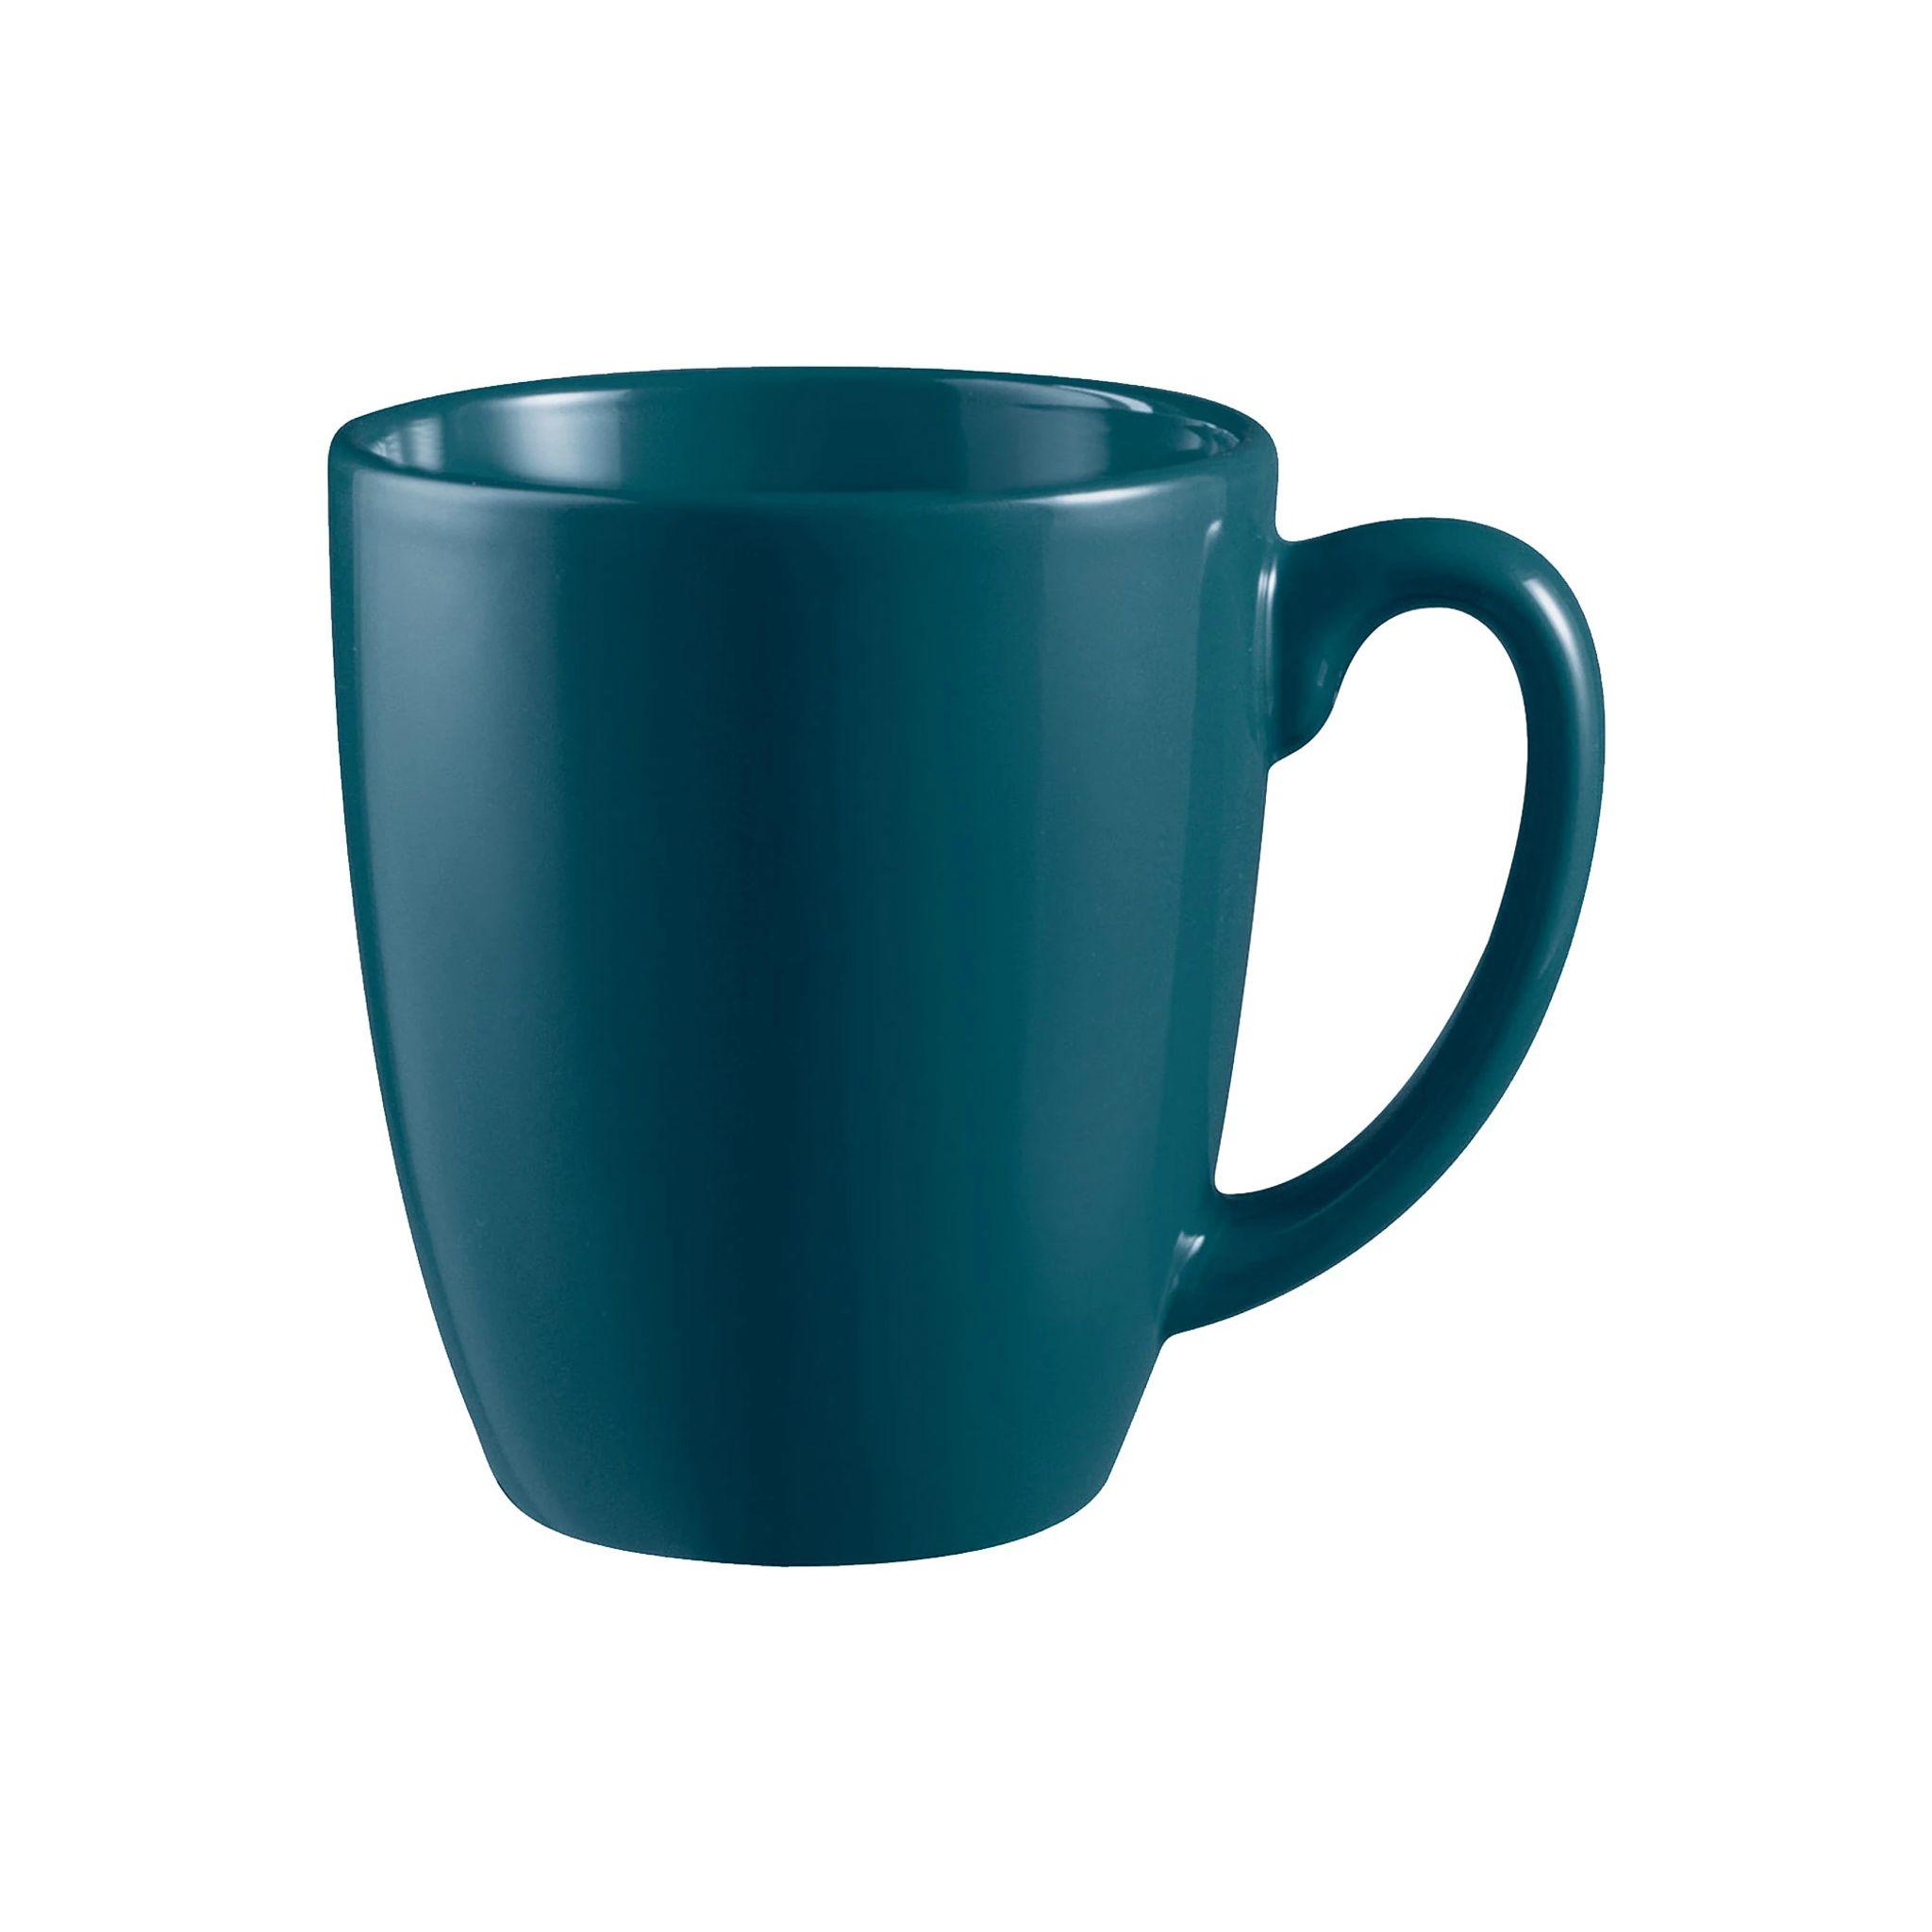 Turquoise 11-ounce Mug